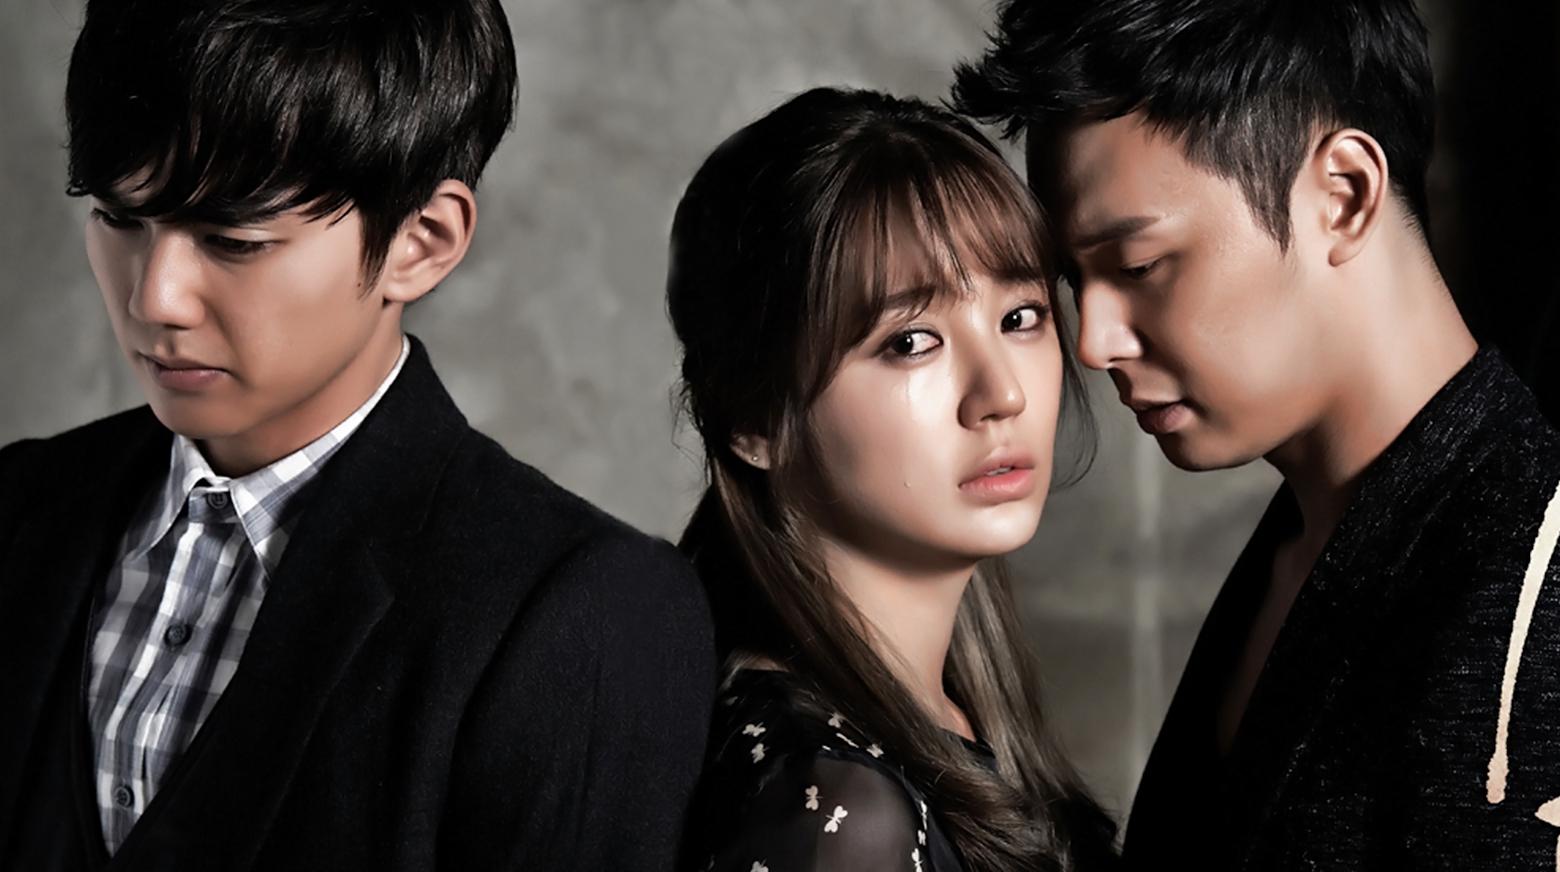 I Miss You Episode 7 - 보고싶다 - Watch Full Episodes Free - Korea